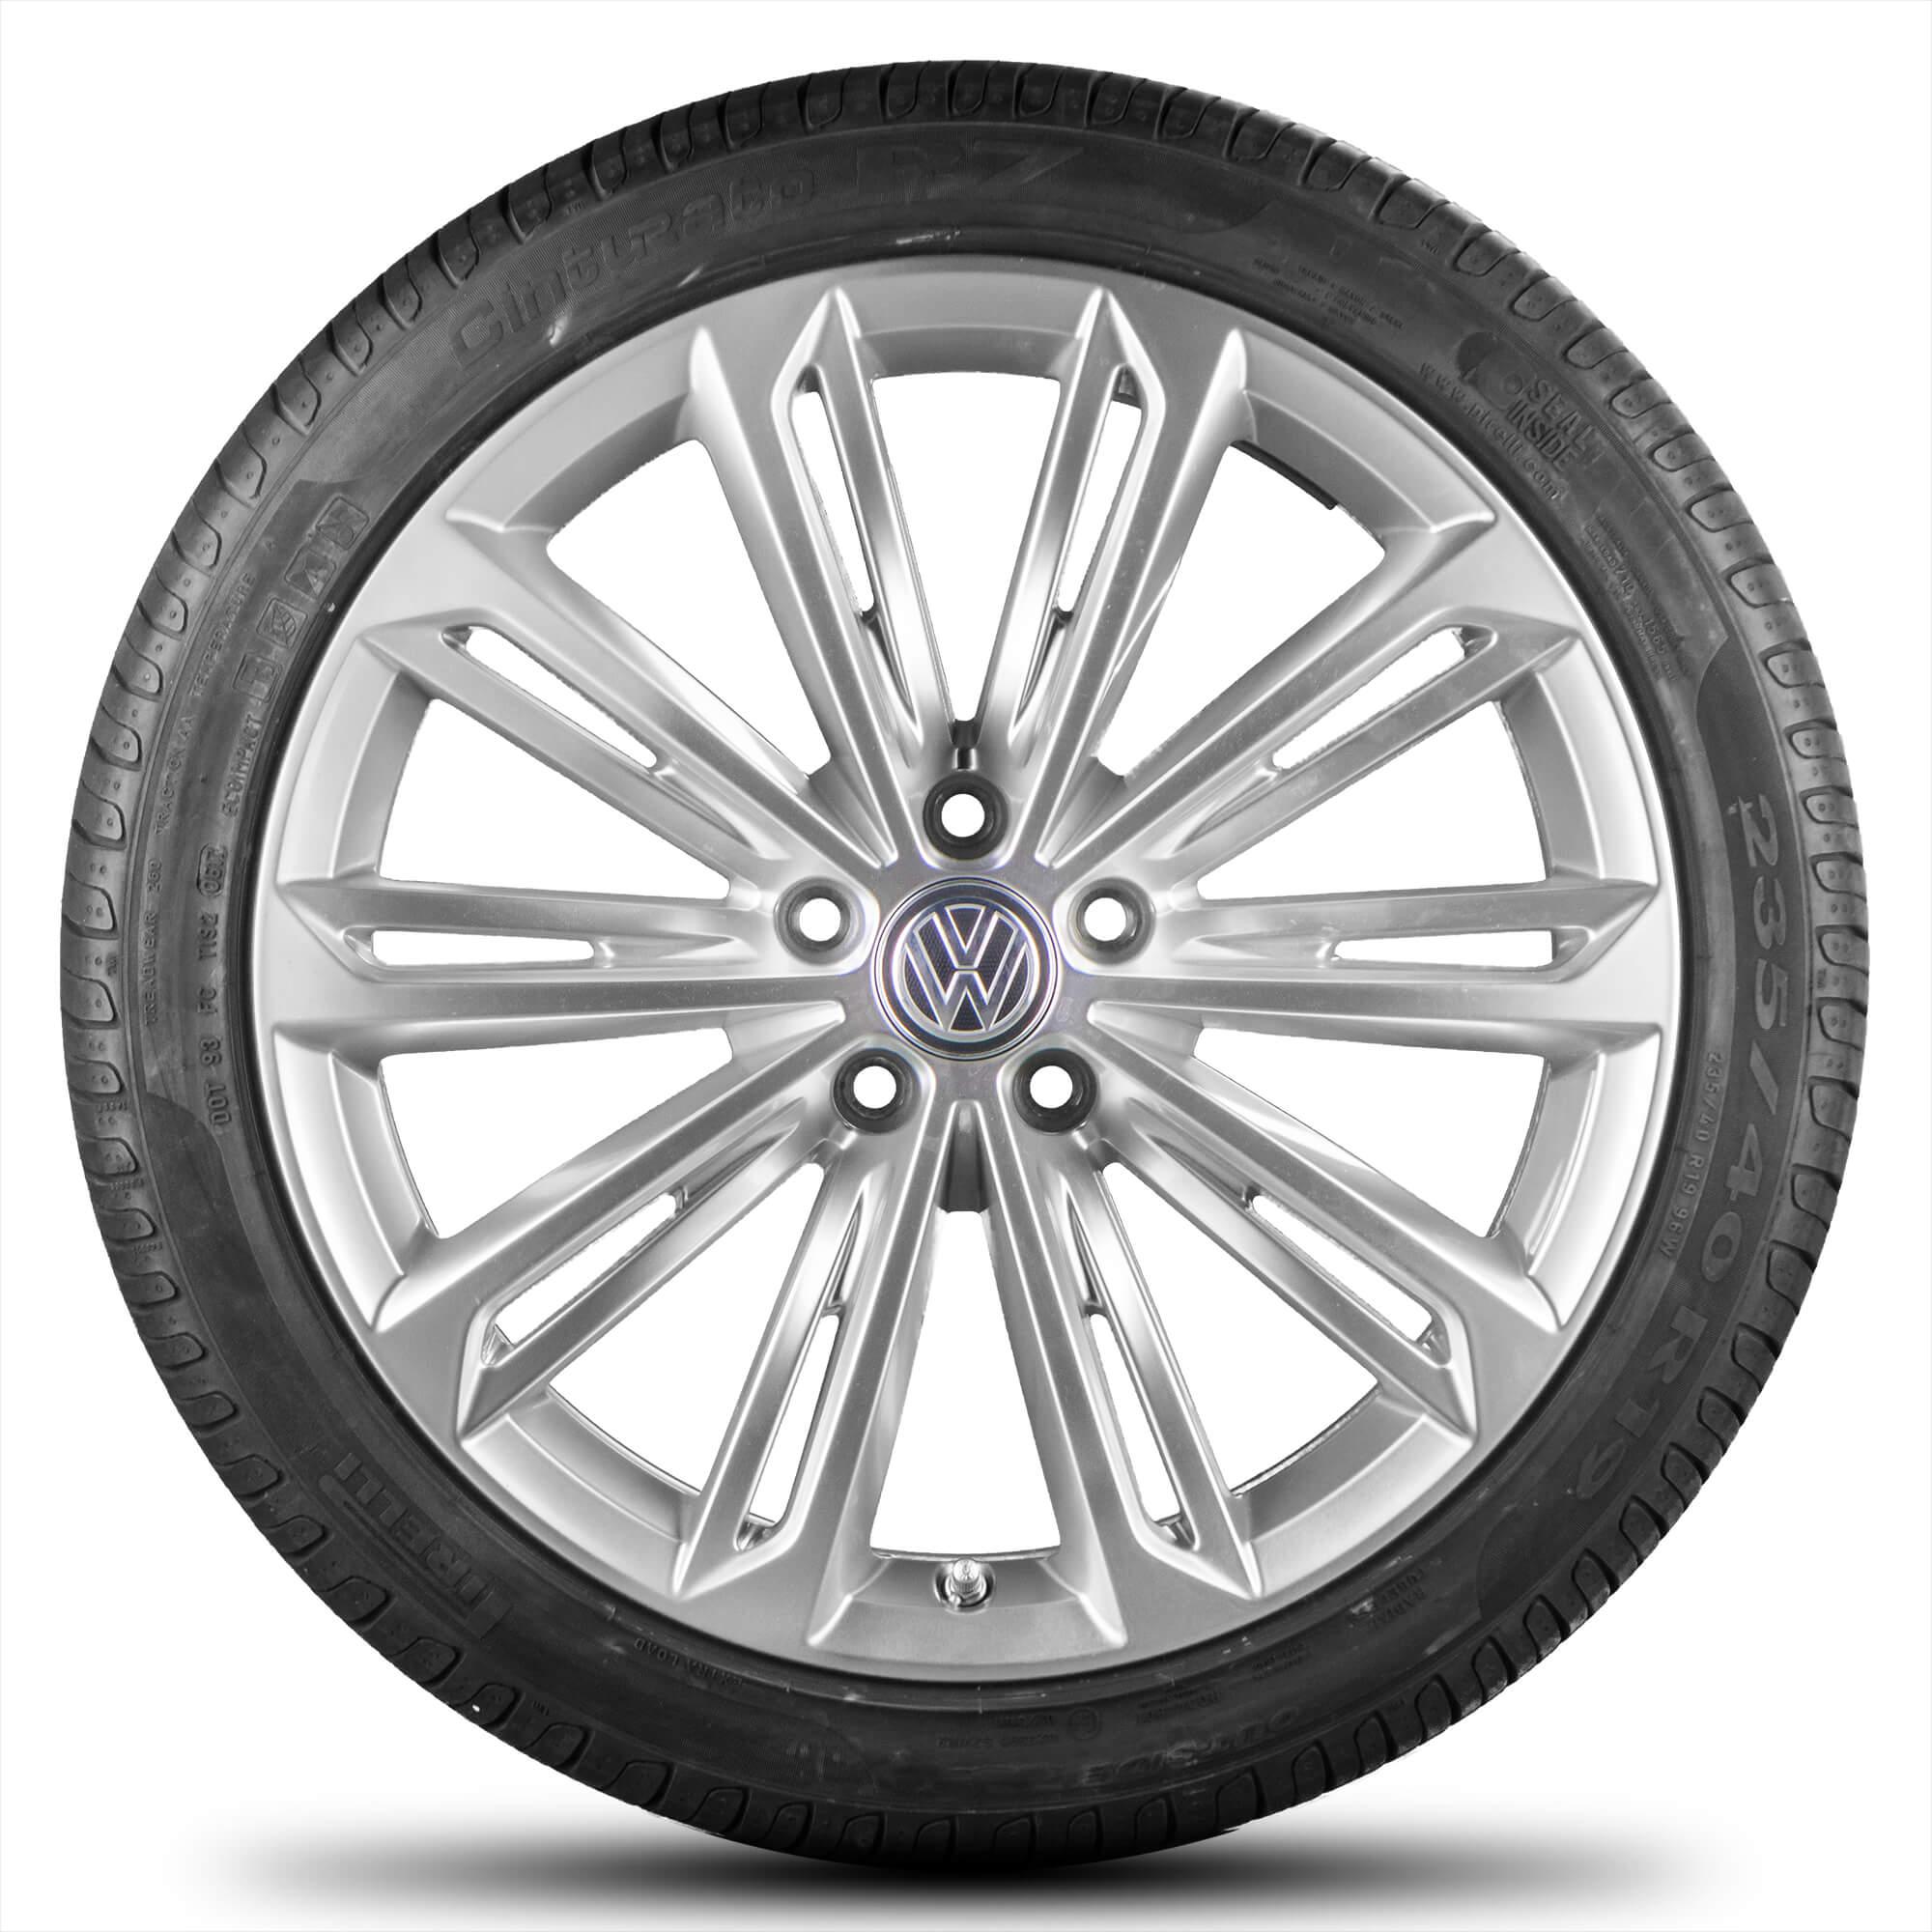 vw passat 3g b8 19 inch rim alloy wheels summer tires r. Black Bedroom Furniture Sets. Home Design Ideas